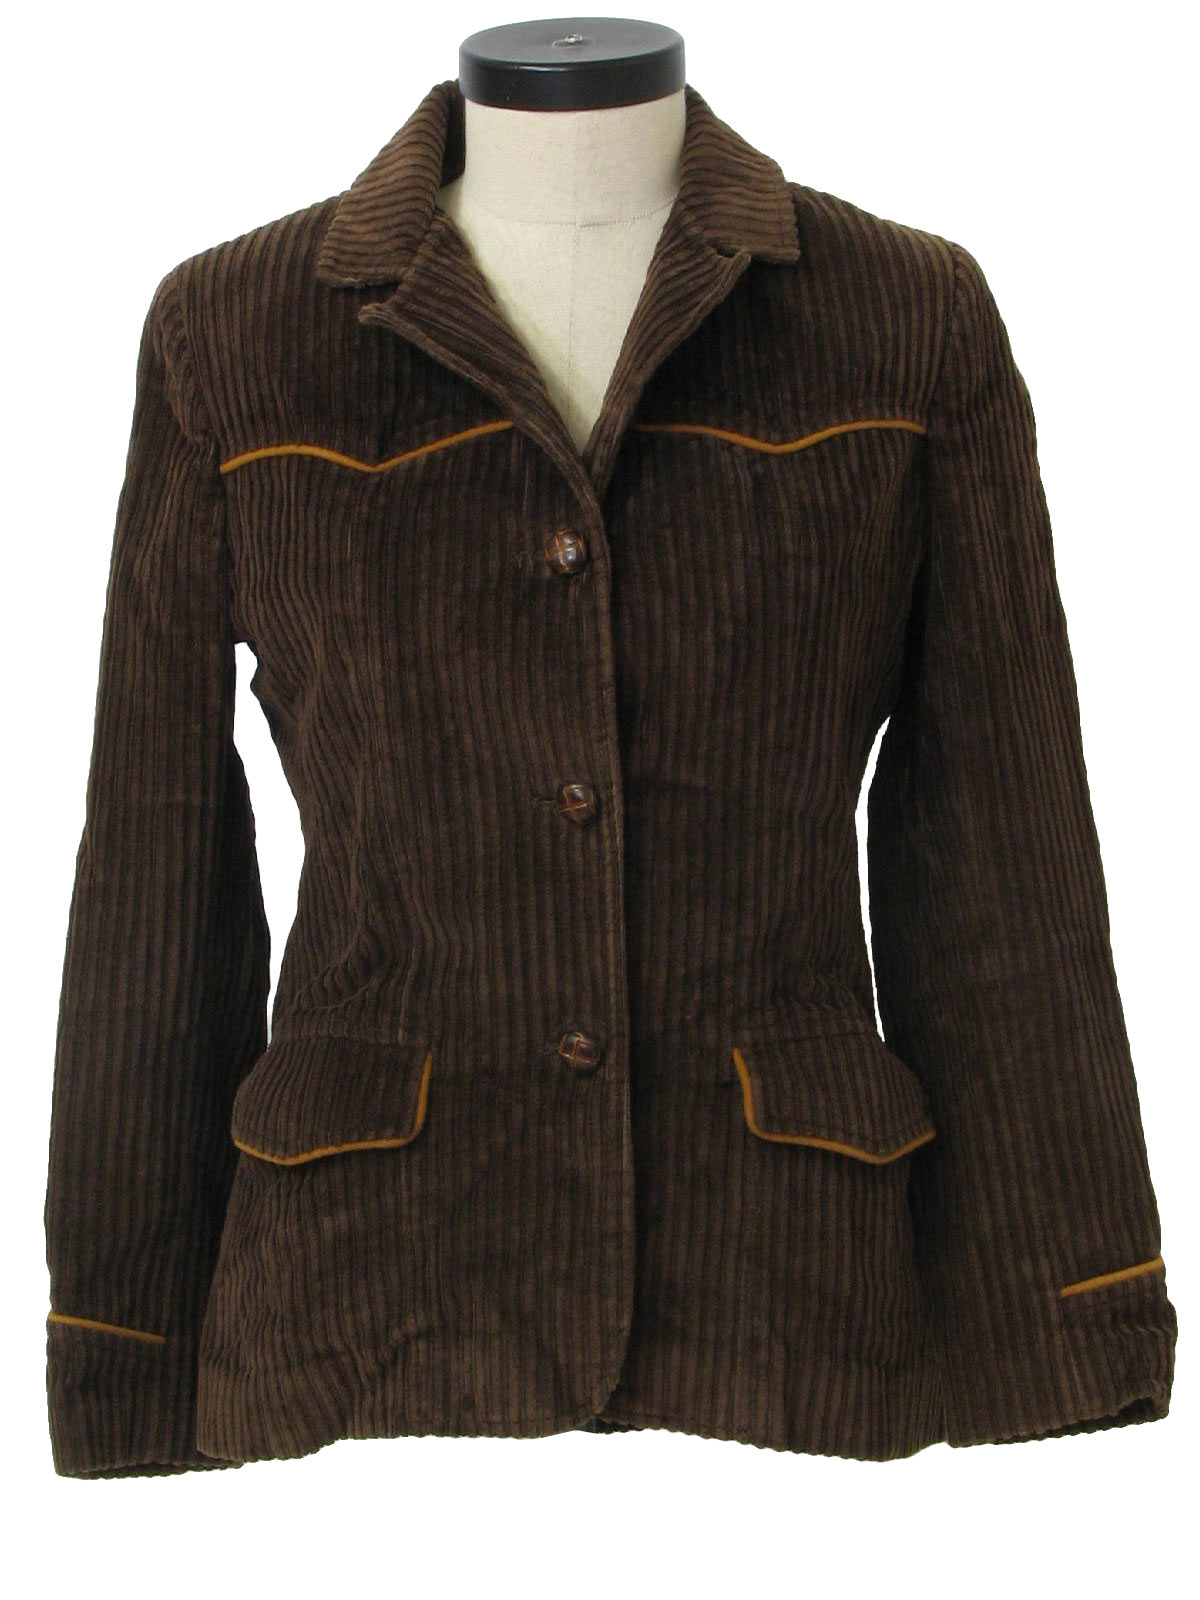 Corduroy Womens Jacket